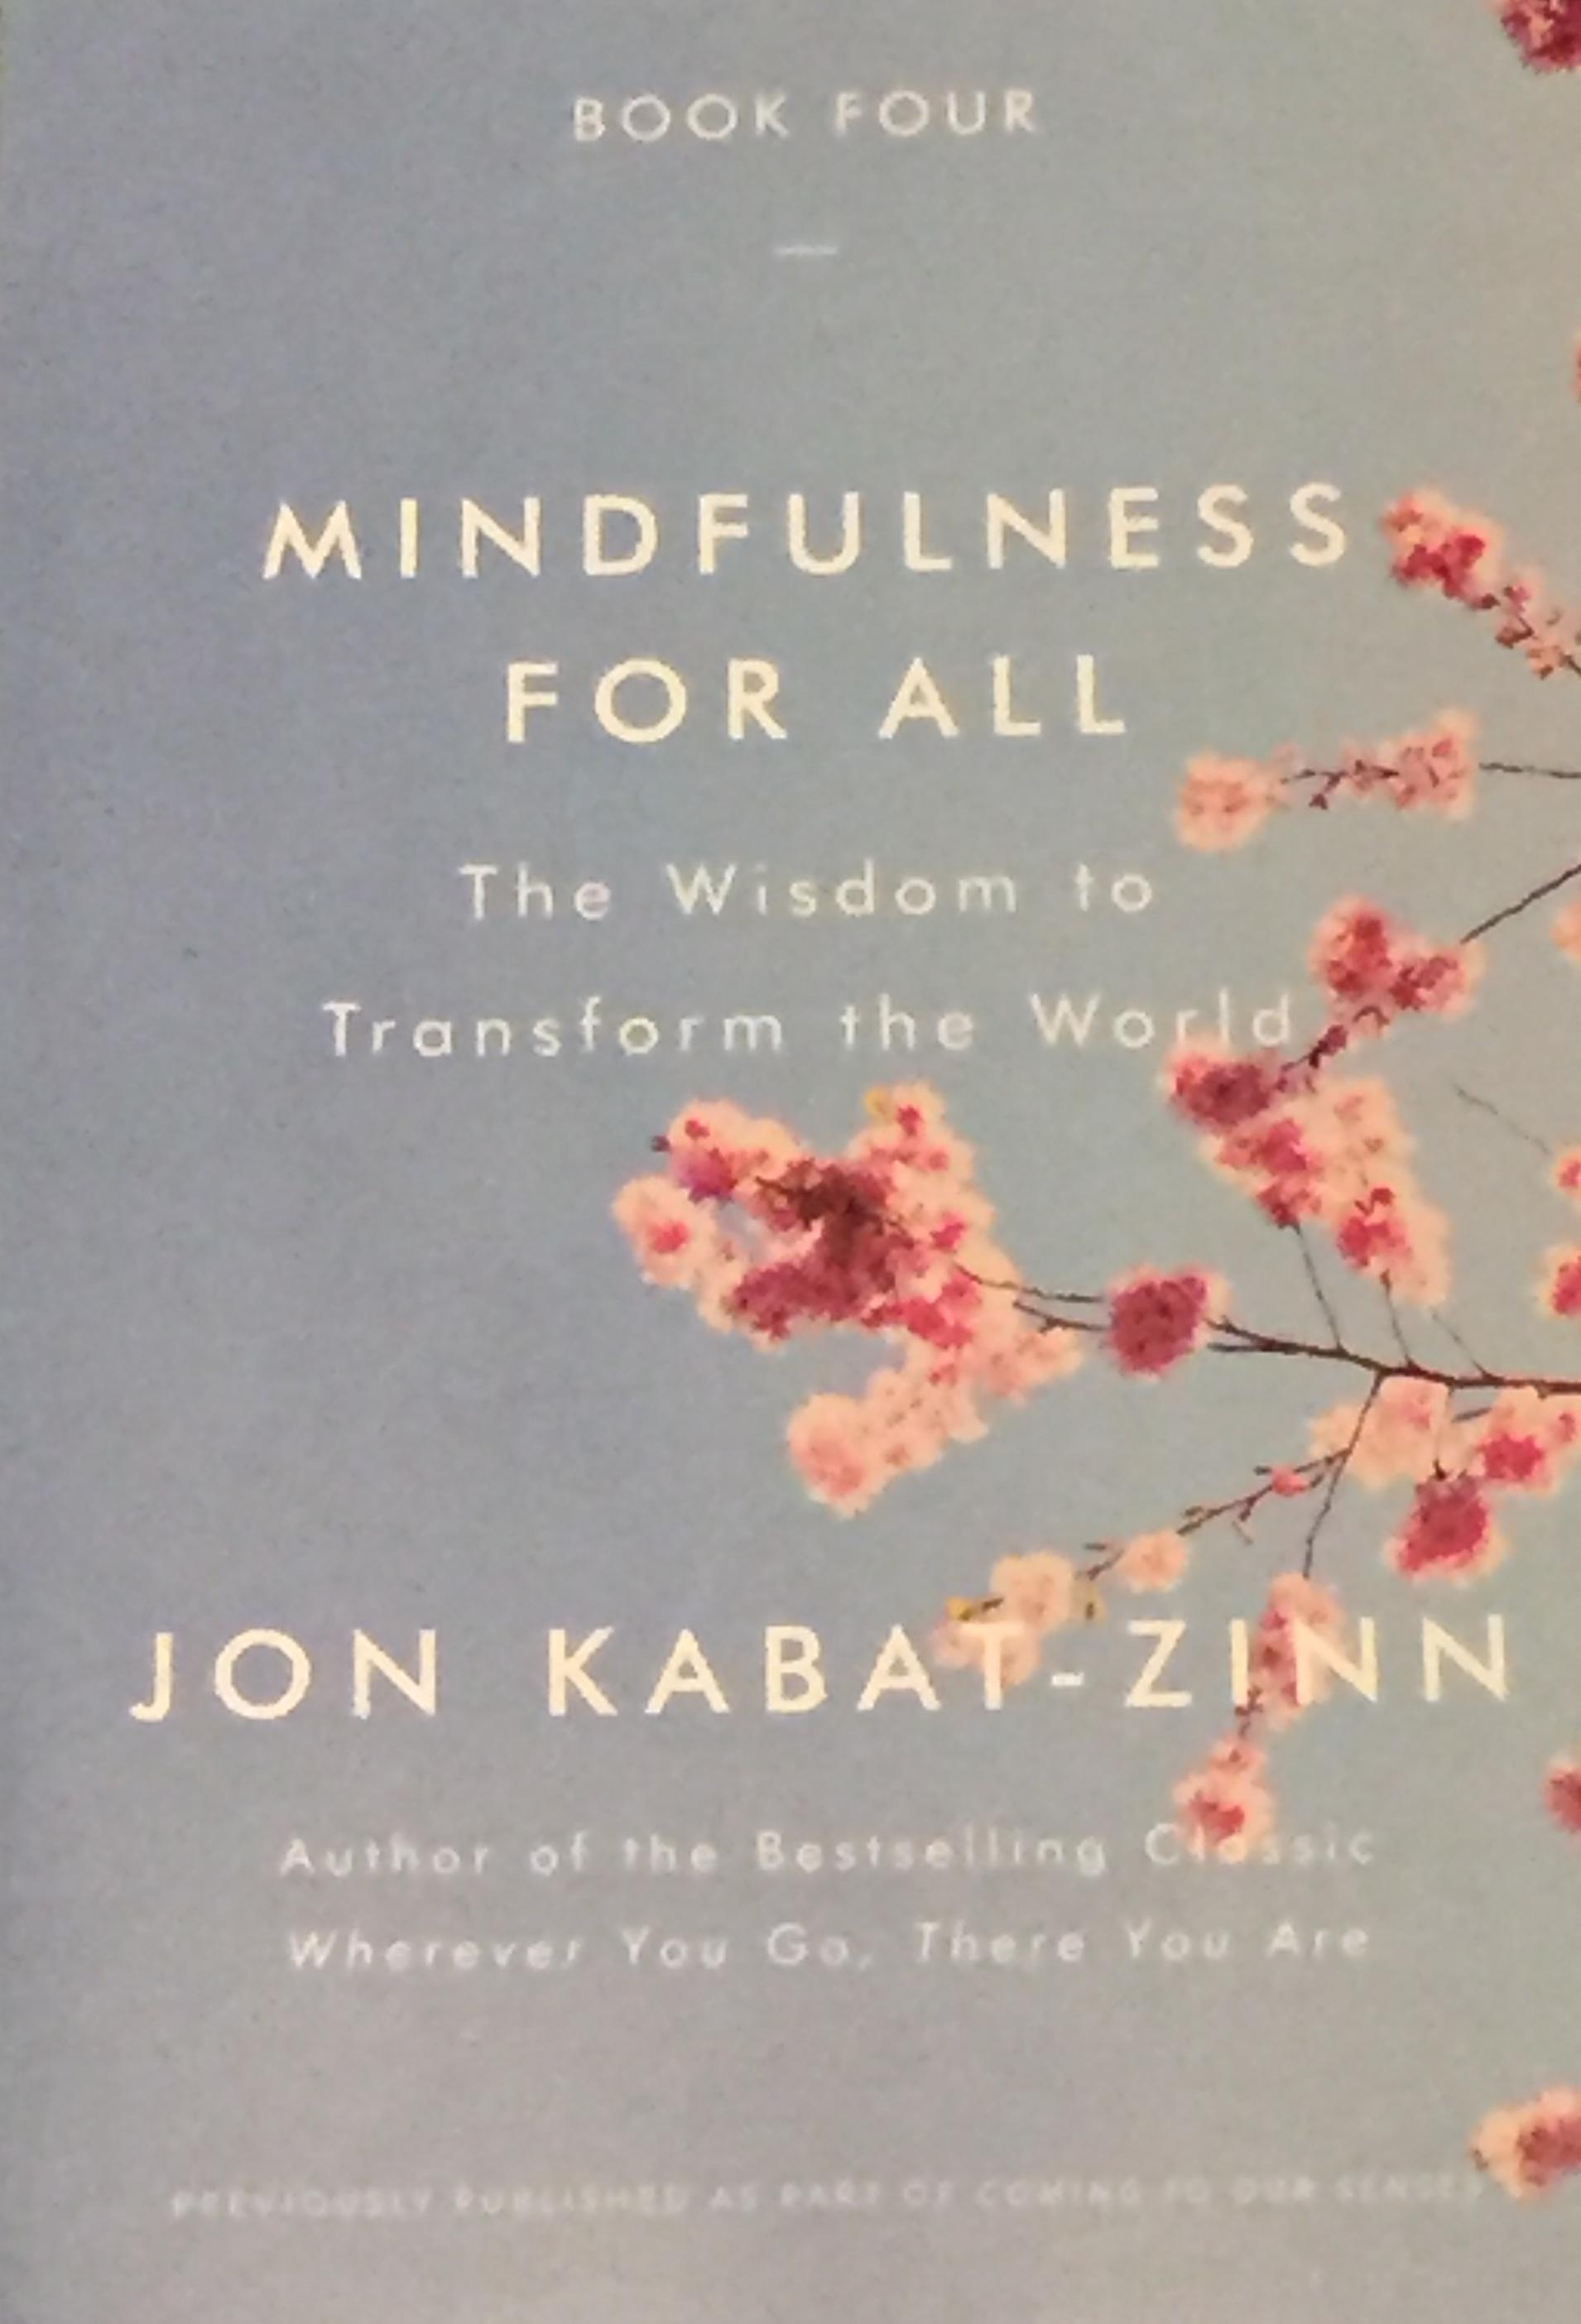 Mindfulness for All by Jon Kabat Zinn